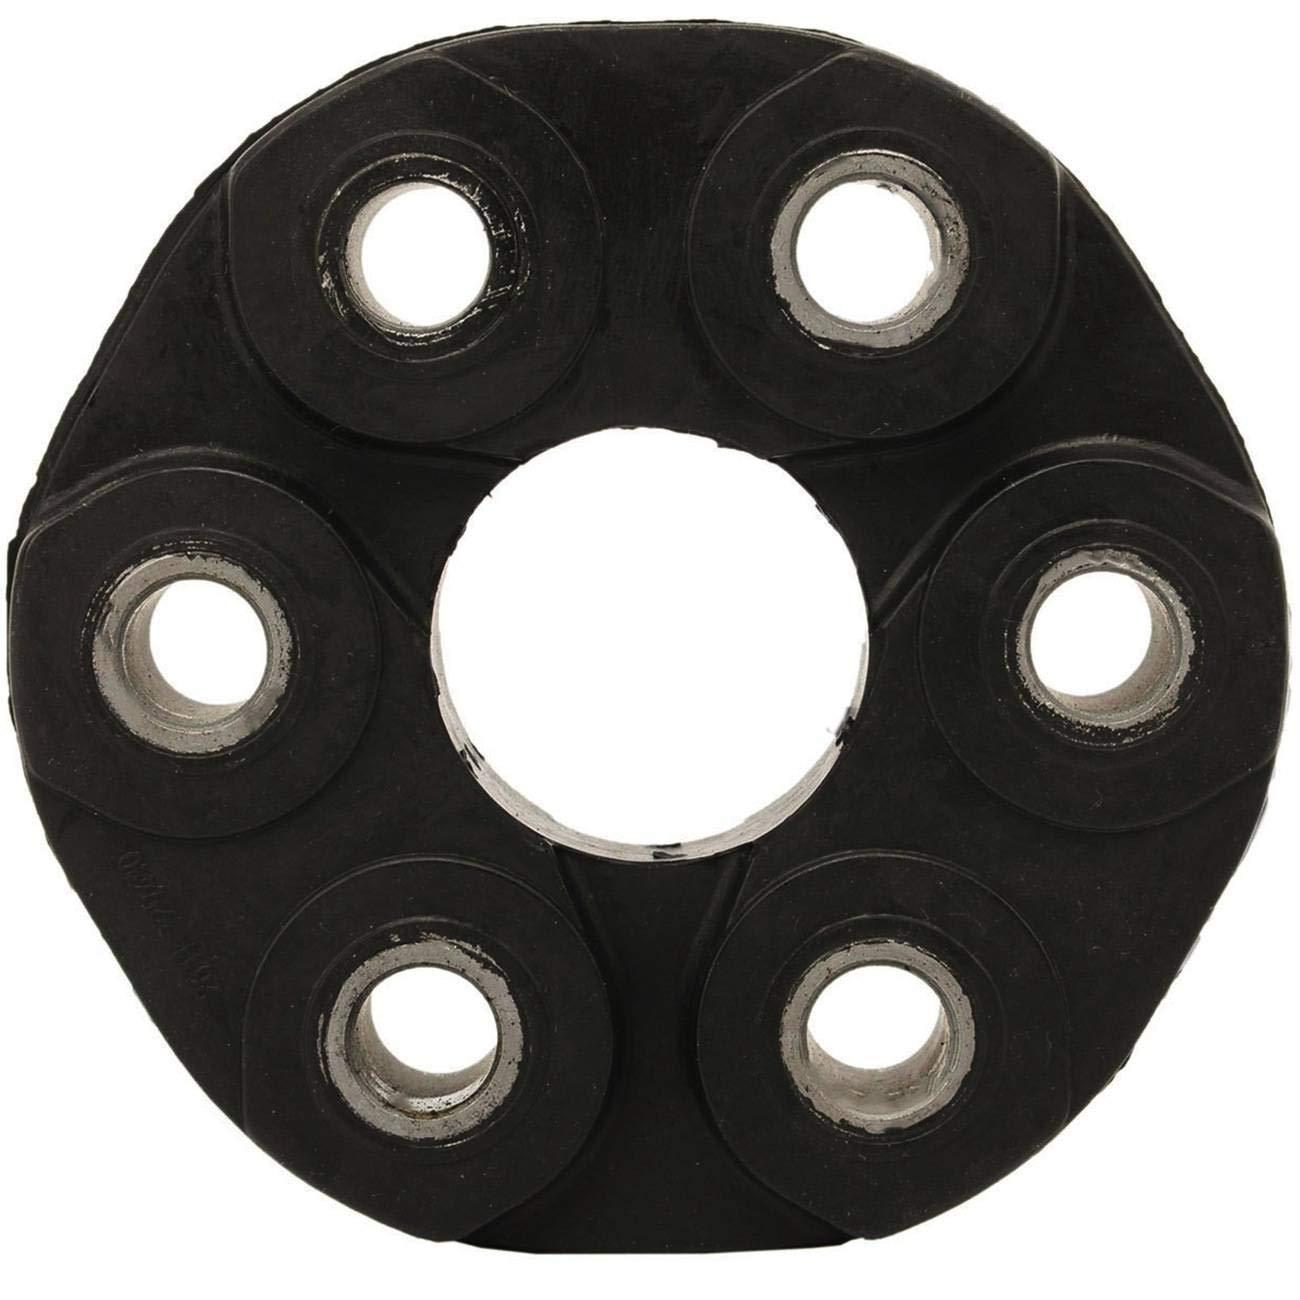 Bapmic 26111227410 Drive Shaft Center Support Bearing + Flex Disc Joint Kit for BMW E85 Z3 E39 E46 328i 528i